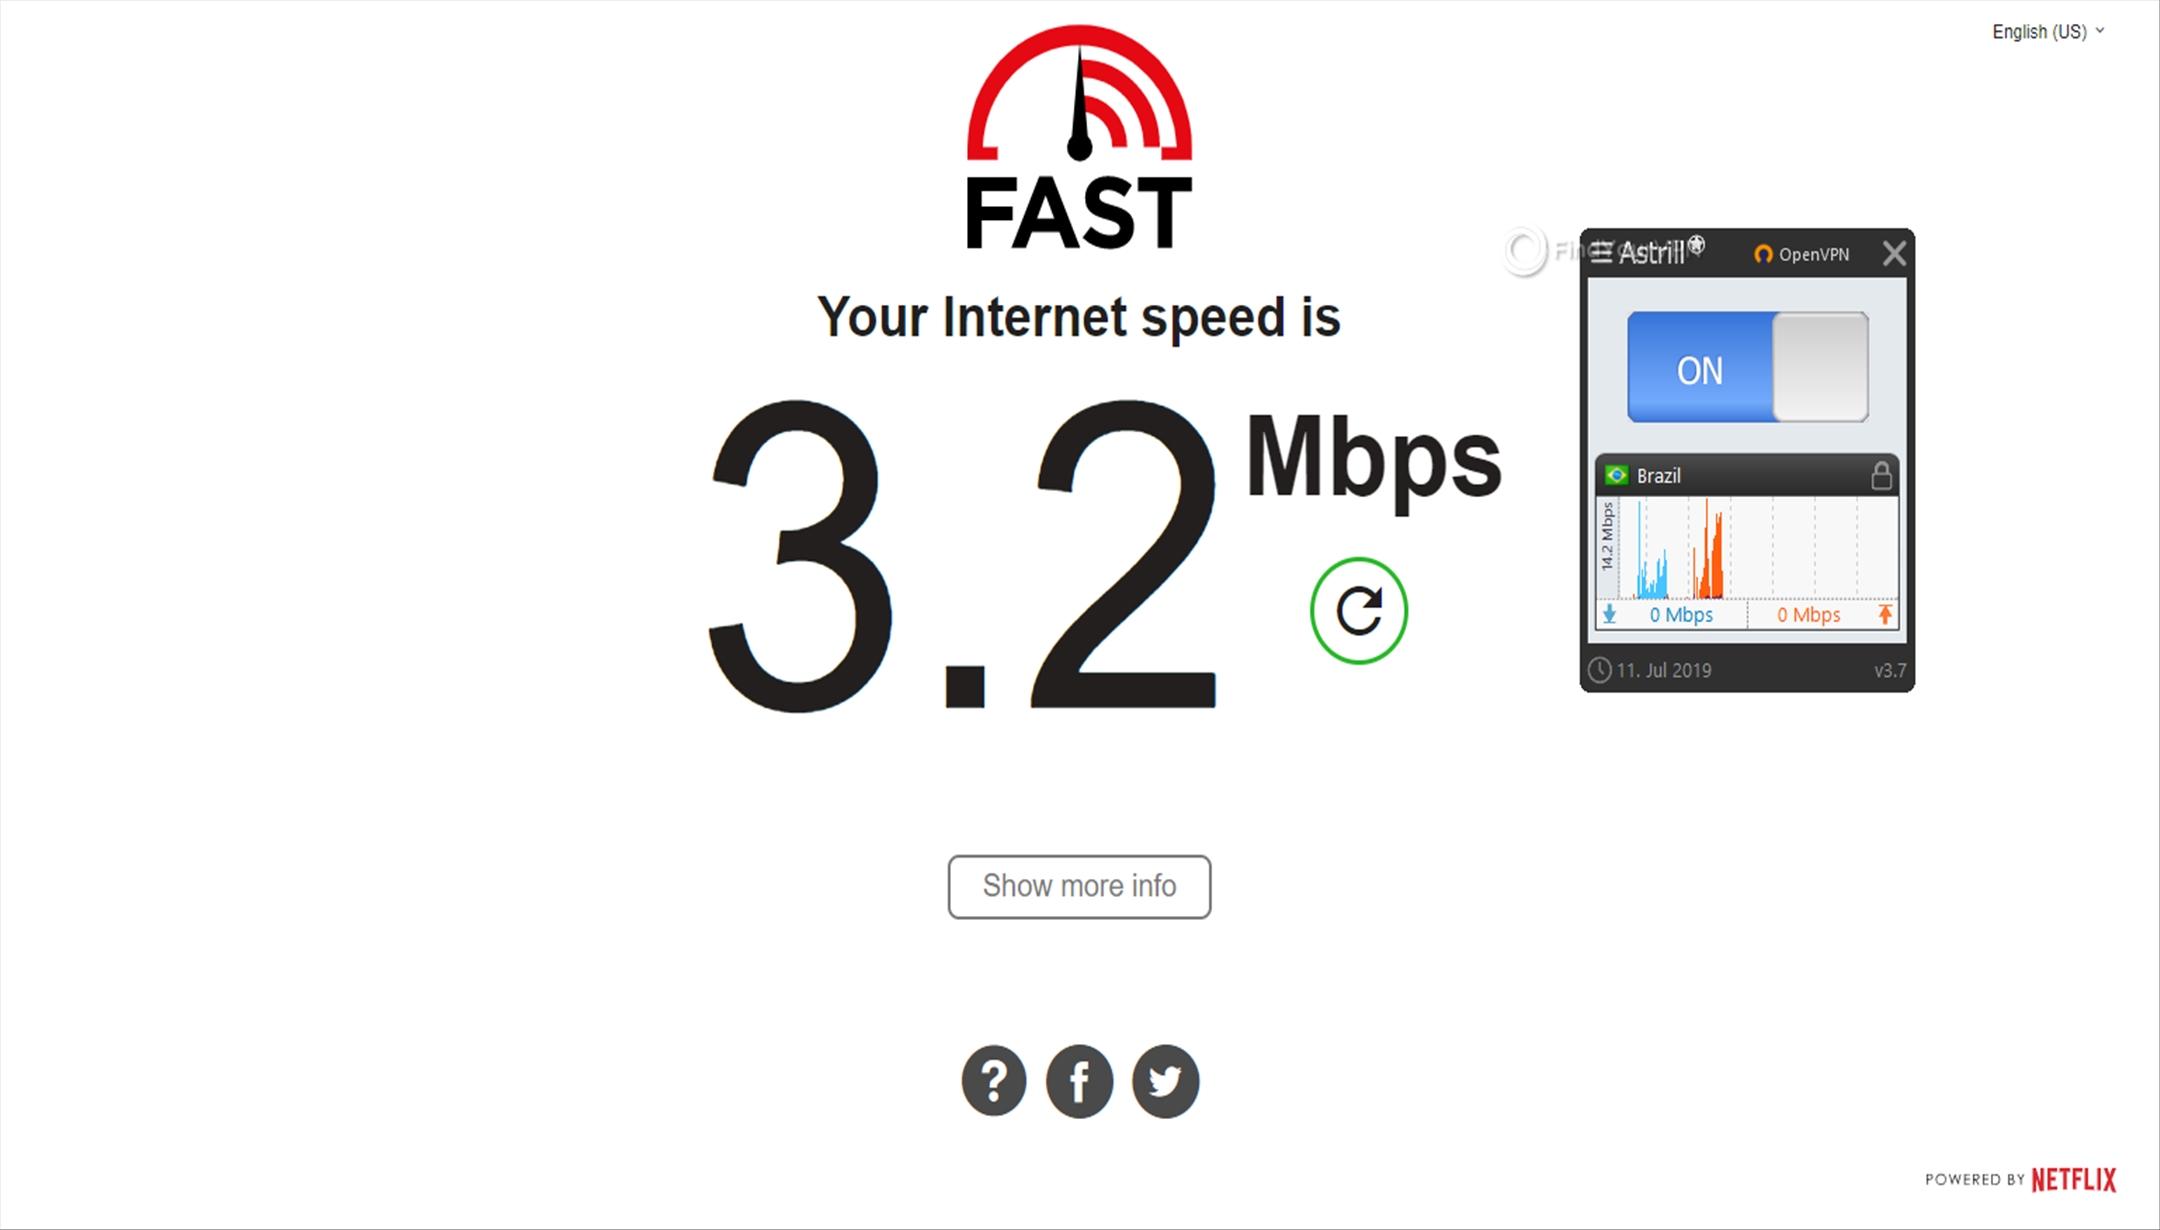 Astrill Speed Test Brazil 3.2 Mbps